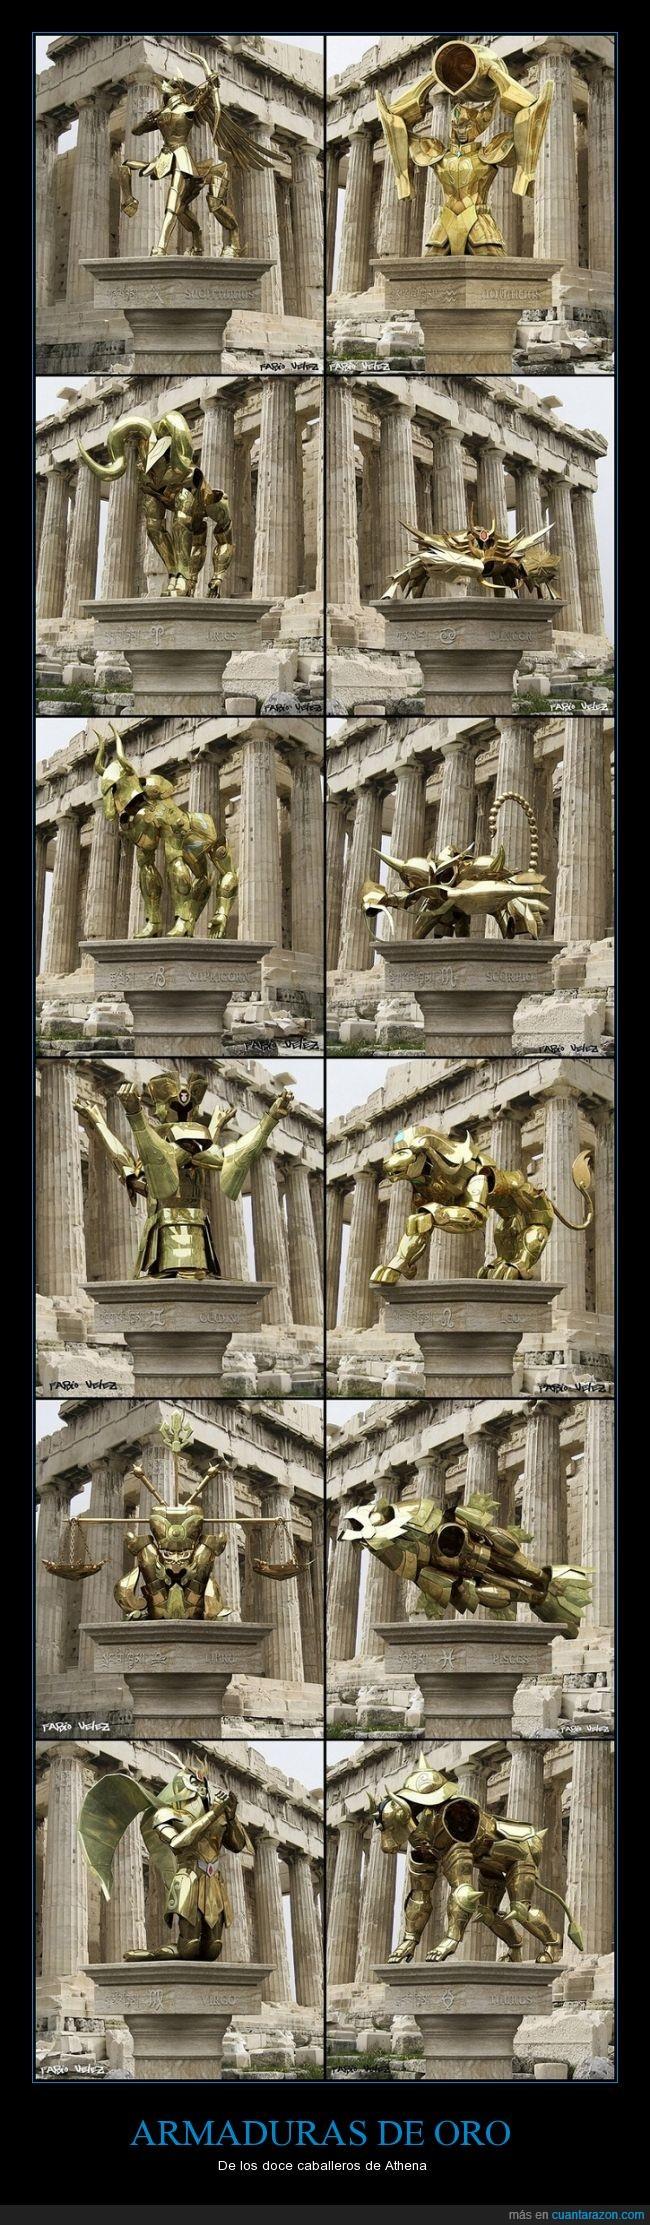 anime,armaduras,athena,caballeros,figura,Los caballeros del zodiaco,oro,Saint Seiya,seiya